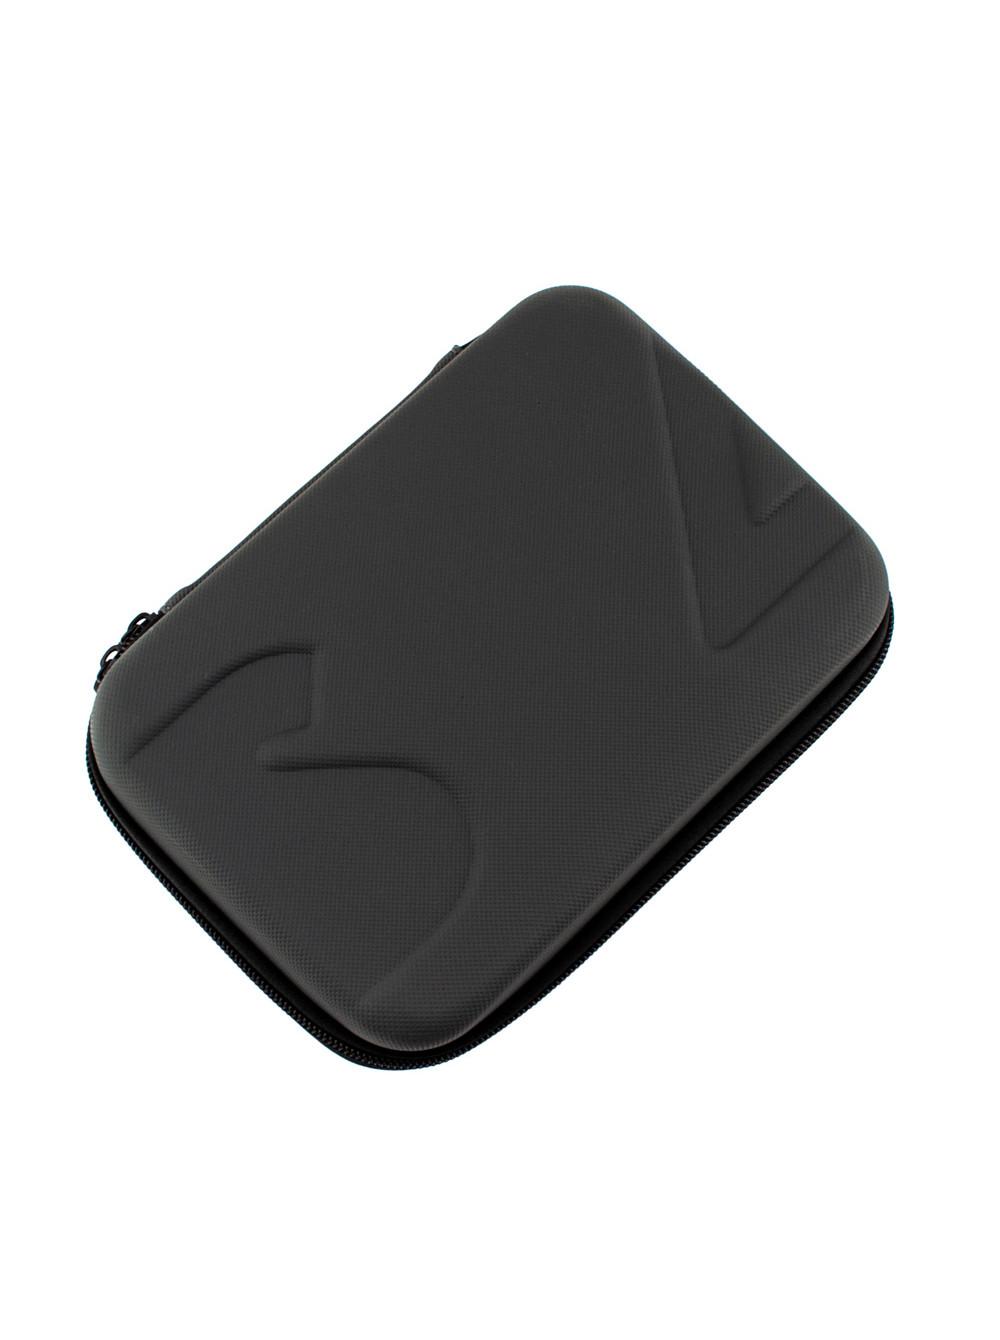 Кейс Sunnylife для DJI OSMO Pocket и Expansion Kit (OP-B148)